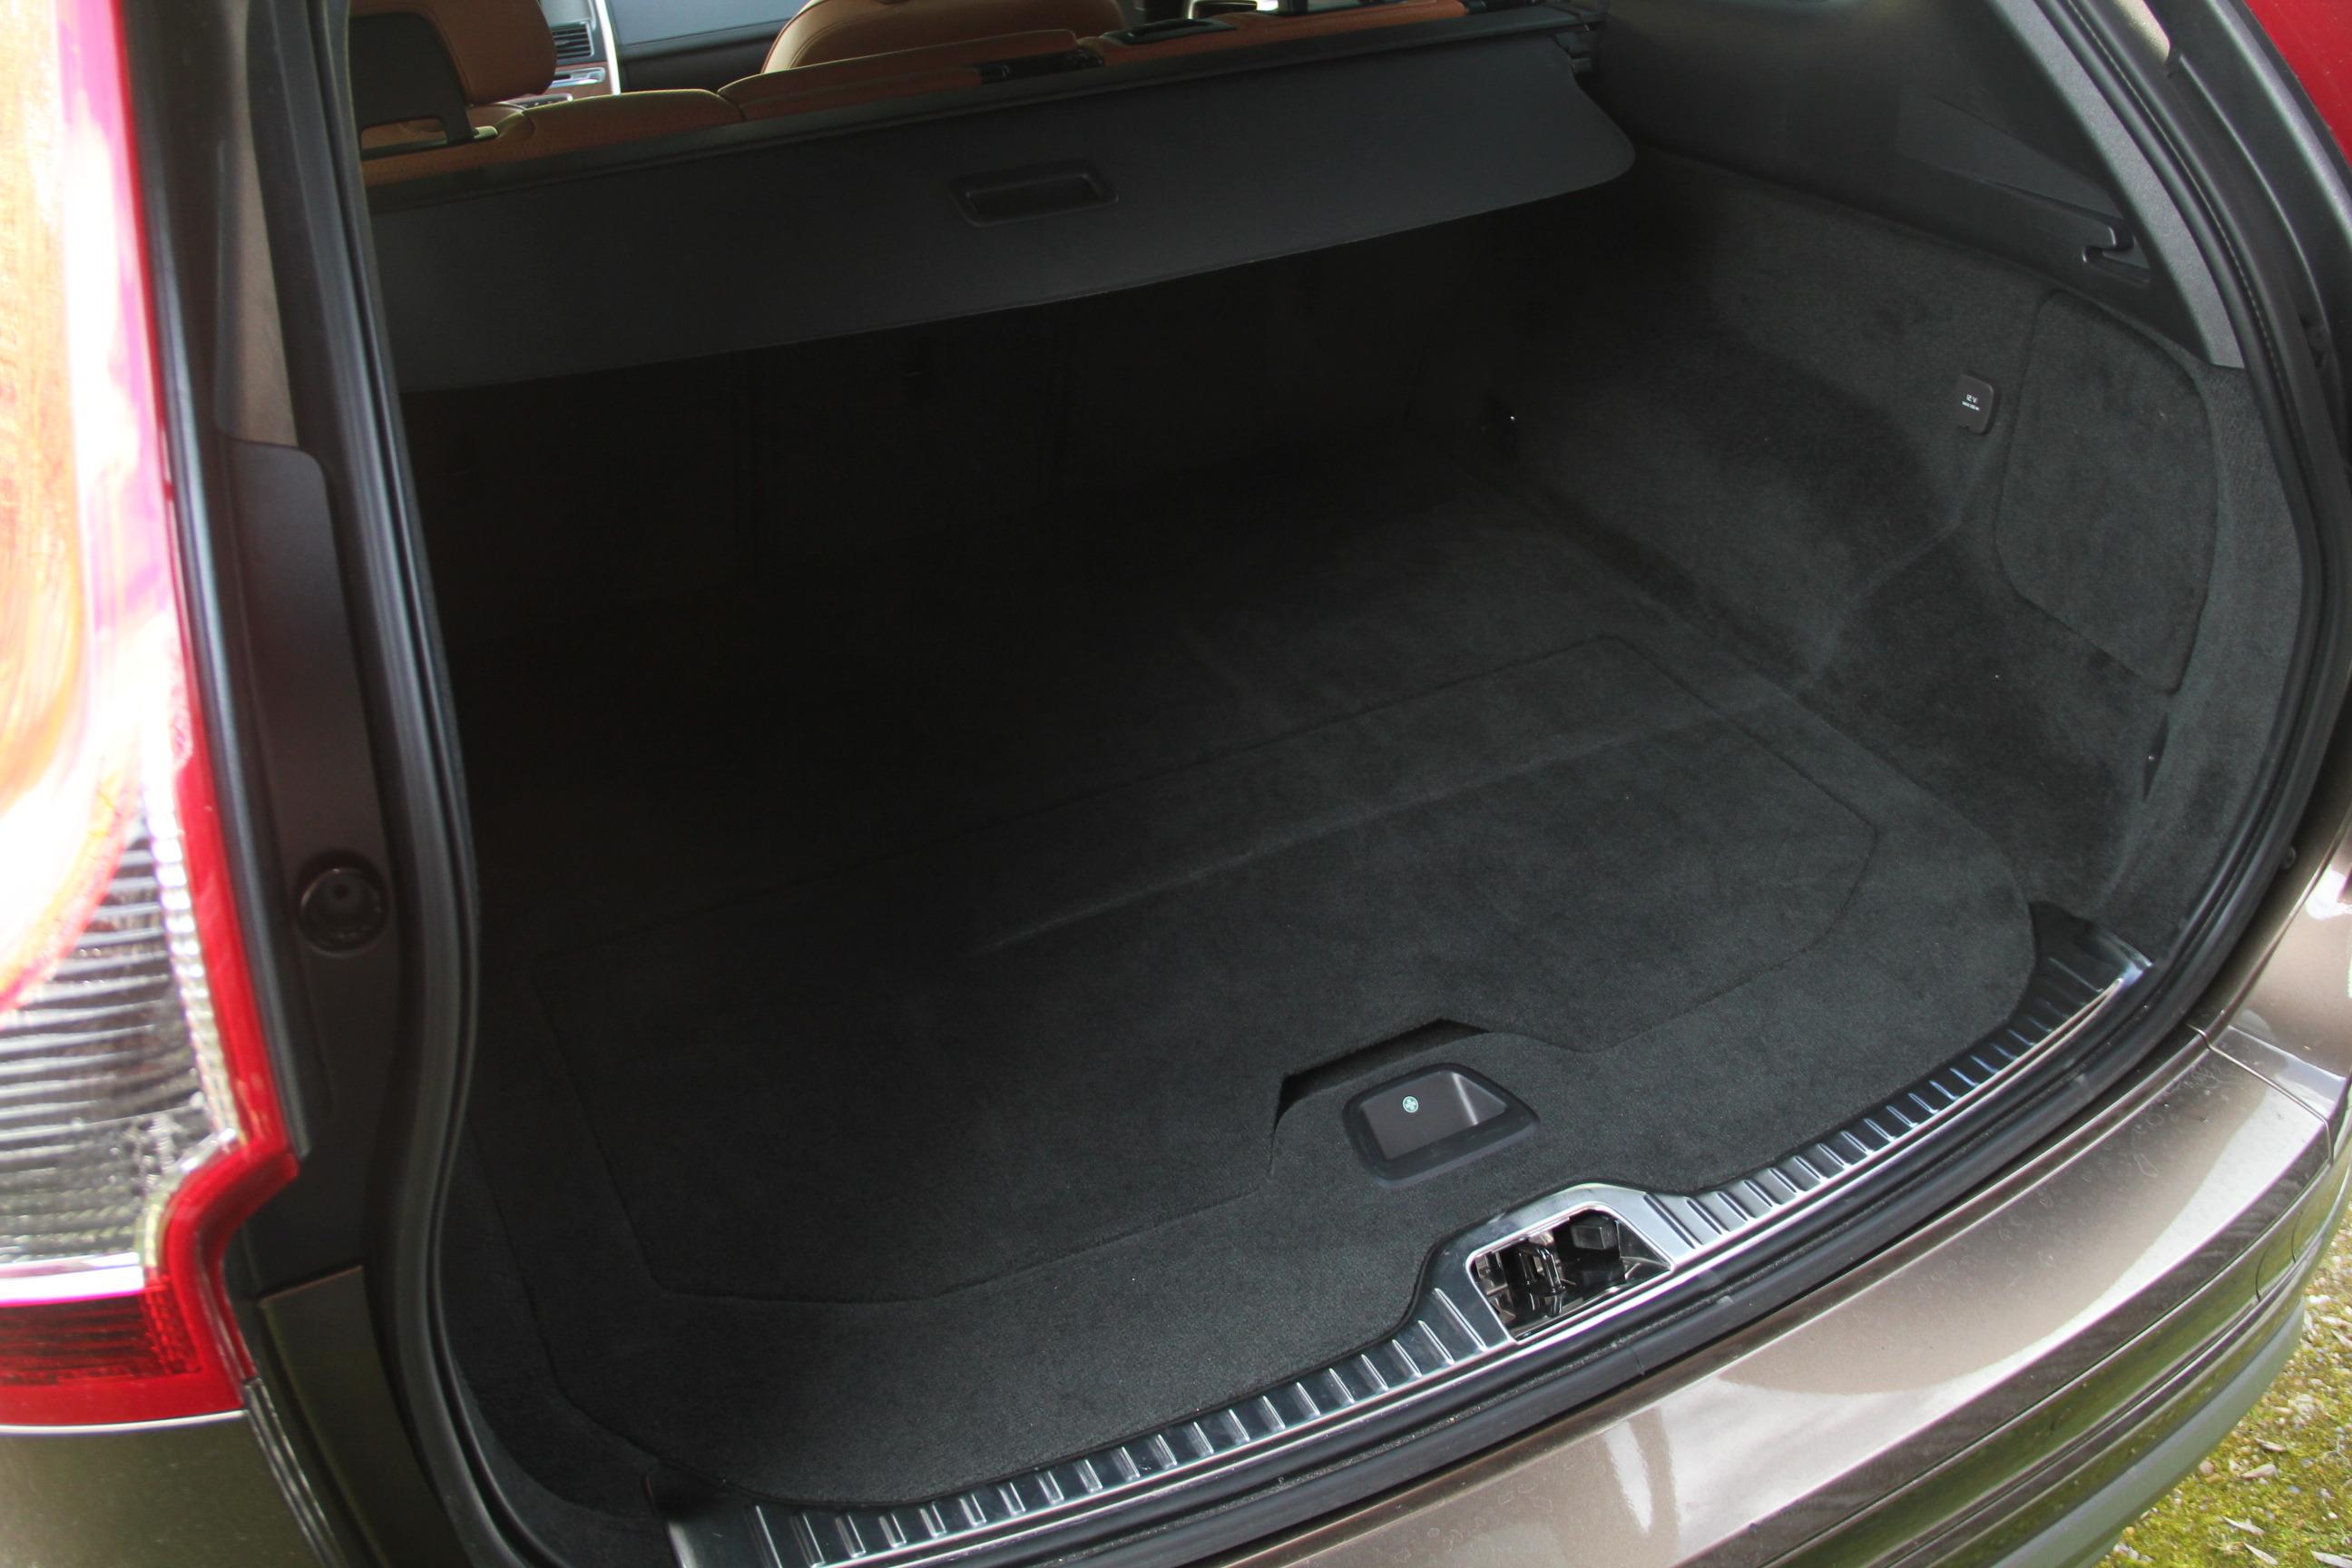 essai volvo xc60 restyl la voiture zlatan. Black Bedroom Furniture Sets. Home Design Ideas